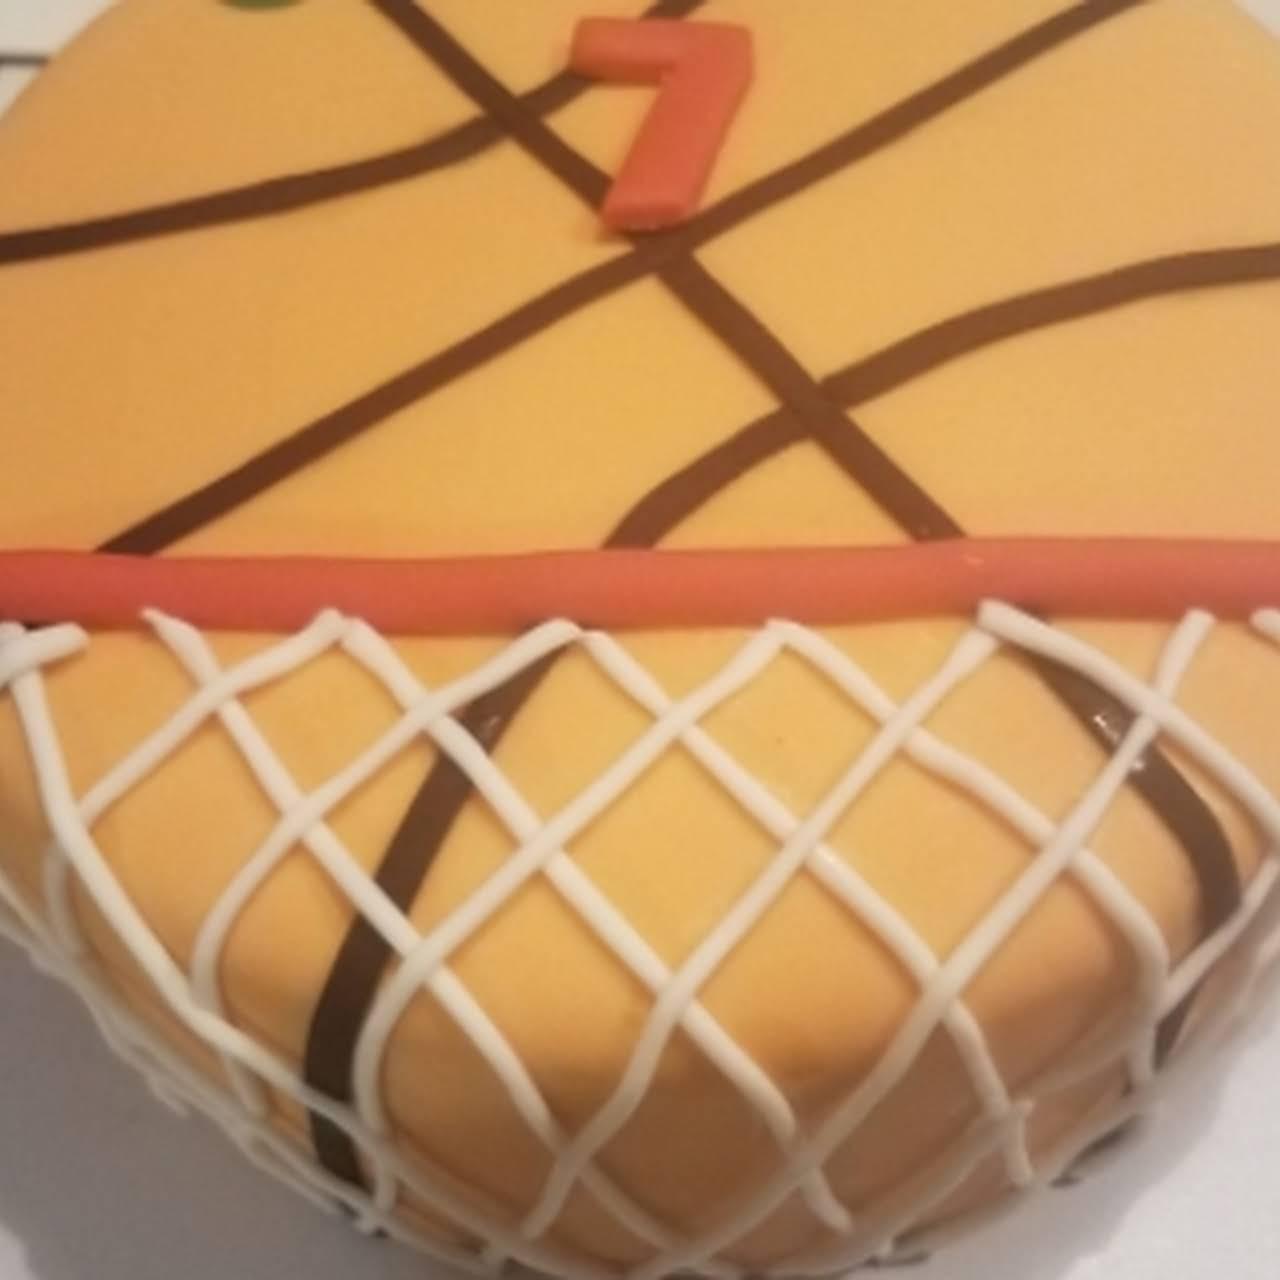 Eat Me - A Custom Cakes Co. - A Family Cake Shop in Sarasota Fl.